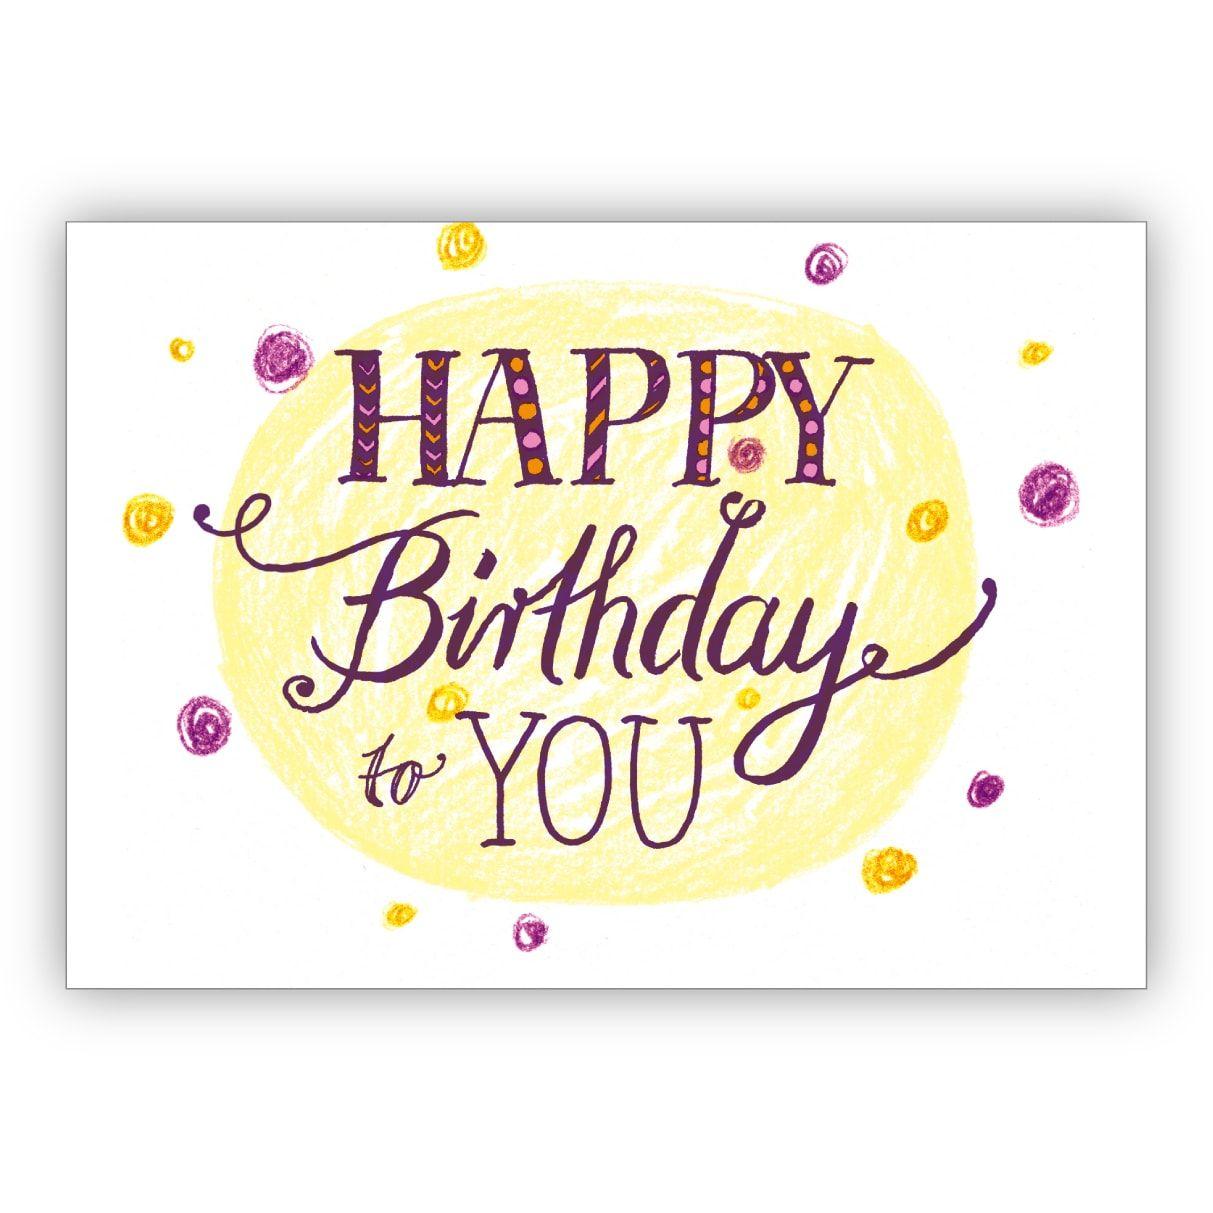 NEU Geburtstagskarte /& Umschlag Grußkarte Geburtstag Happy Birthday Spaß Karte